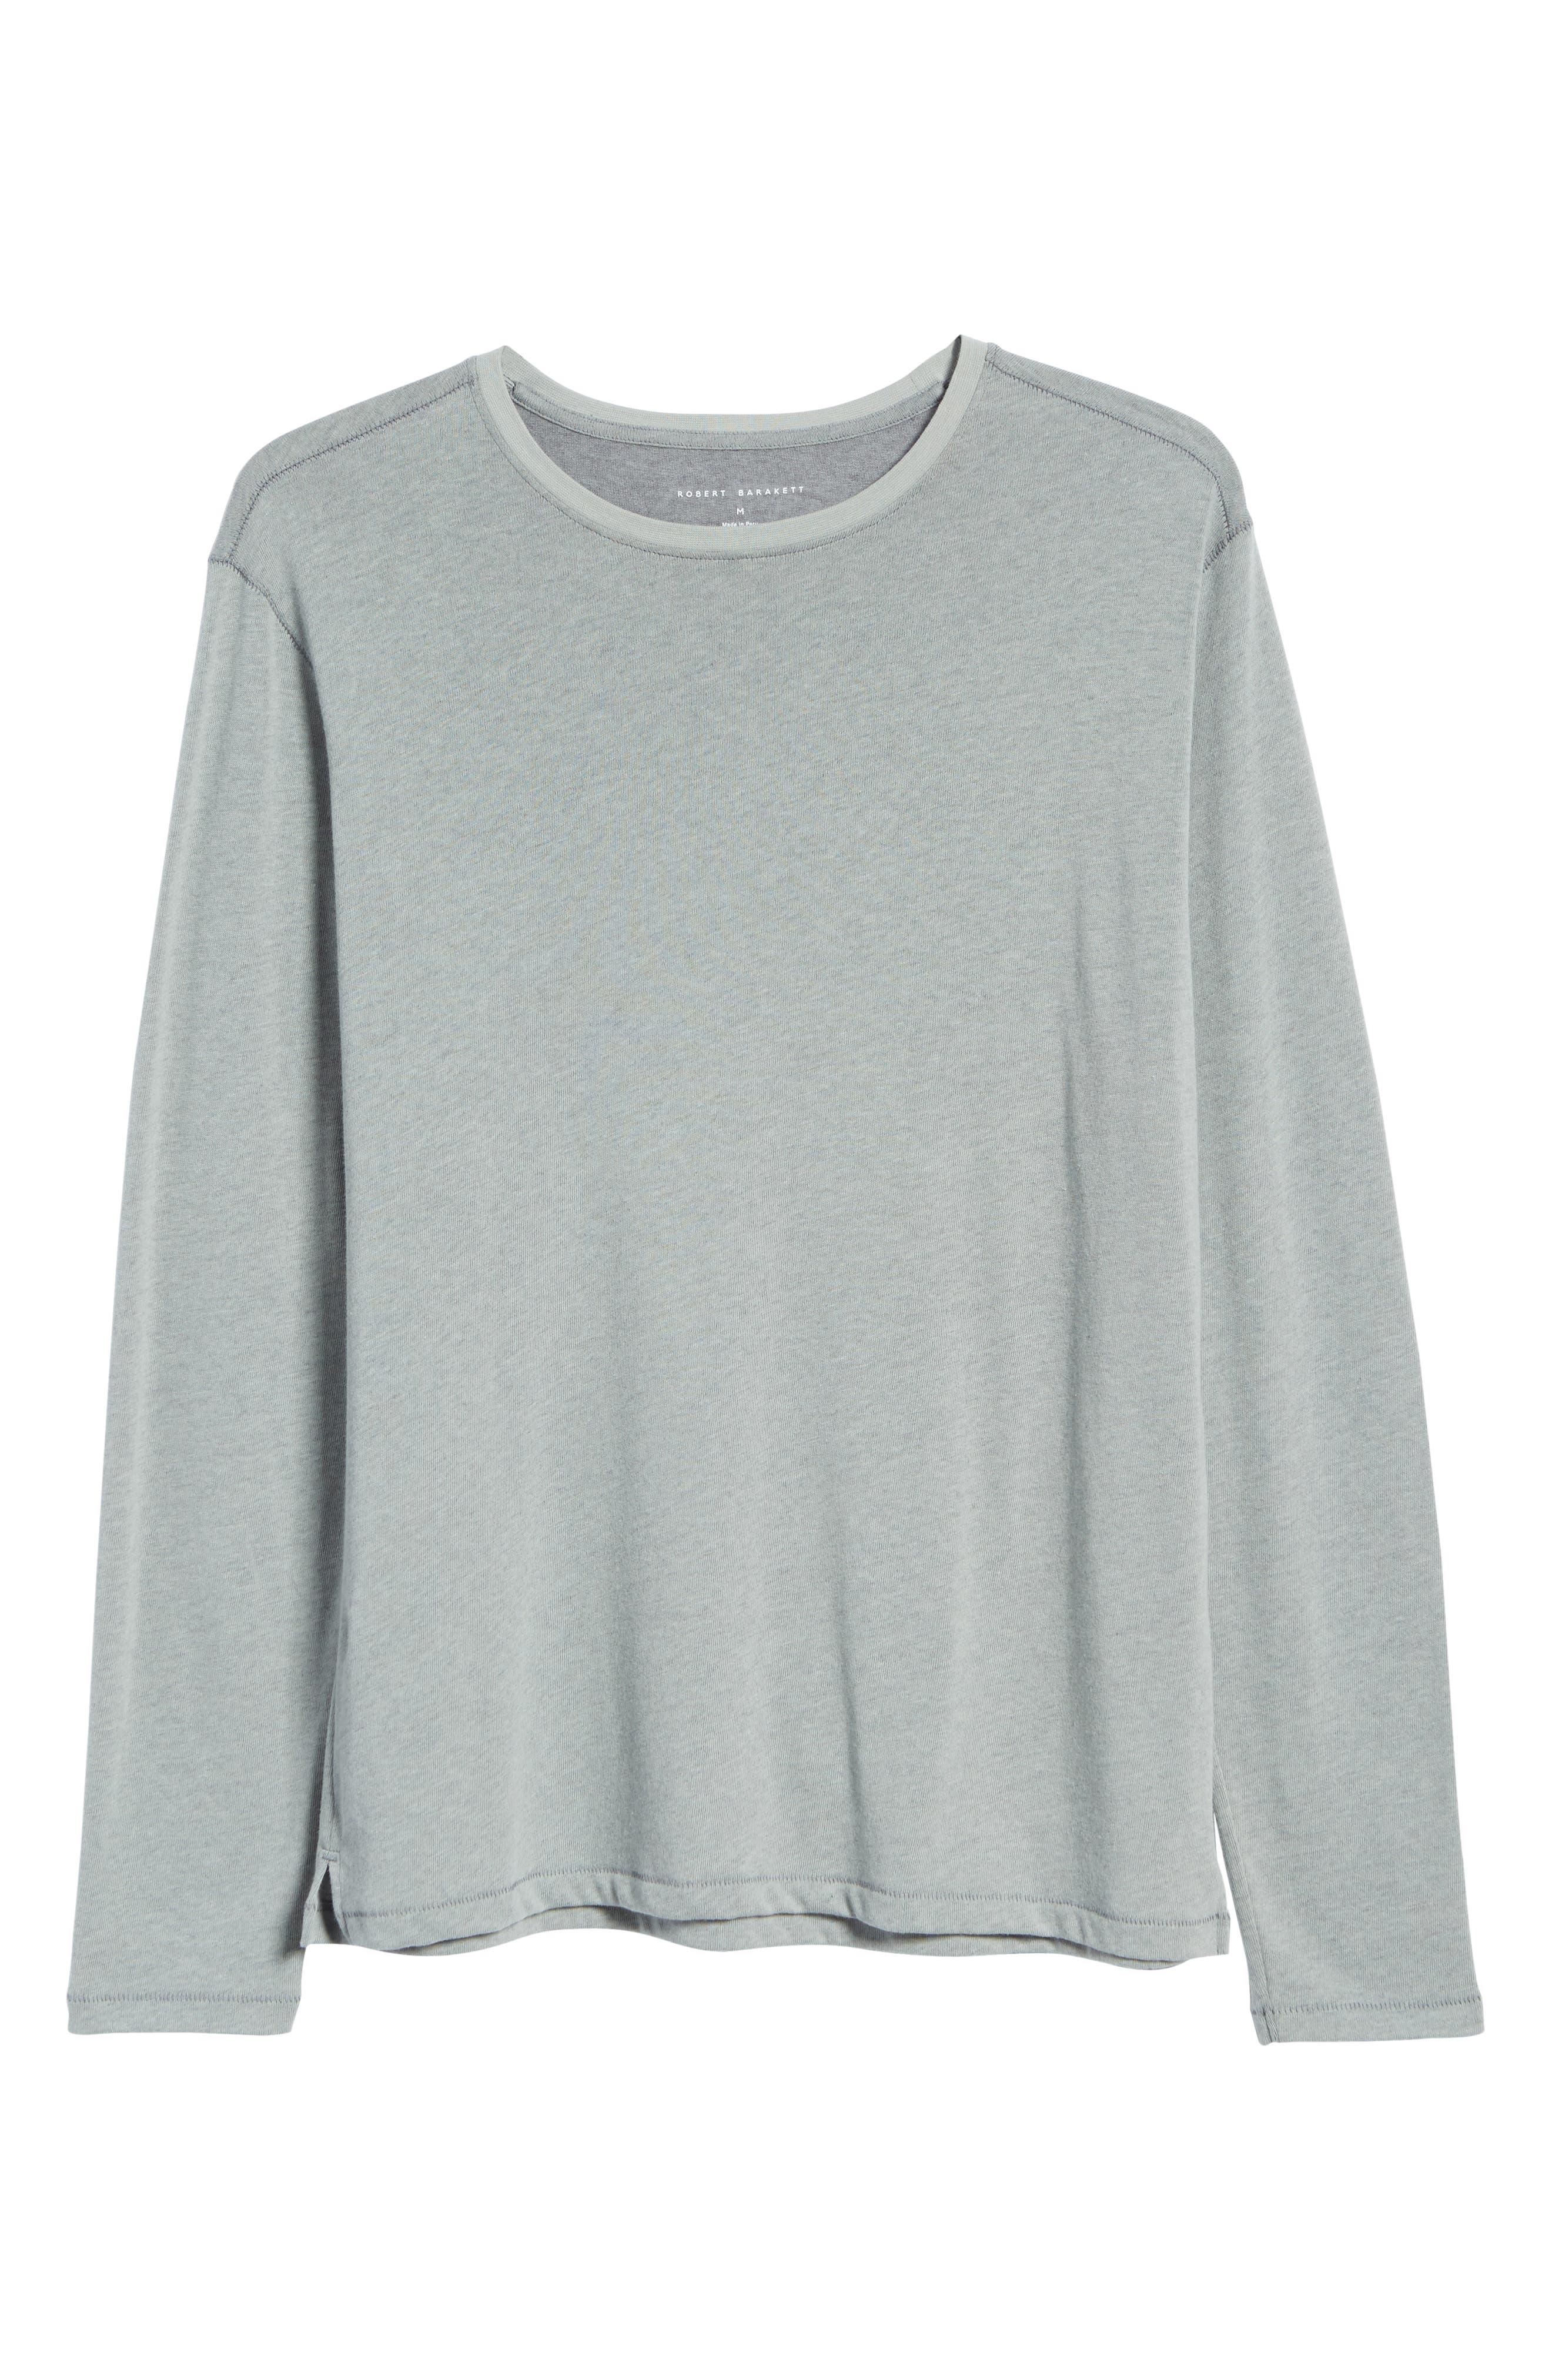 White Rock T-Shirt,                             Alternate thumbnail 6, color,                             LIGHT GREY